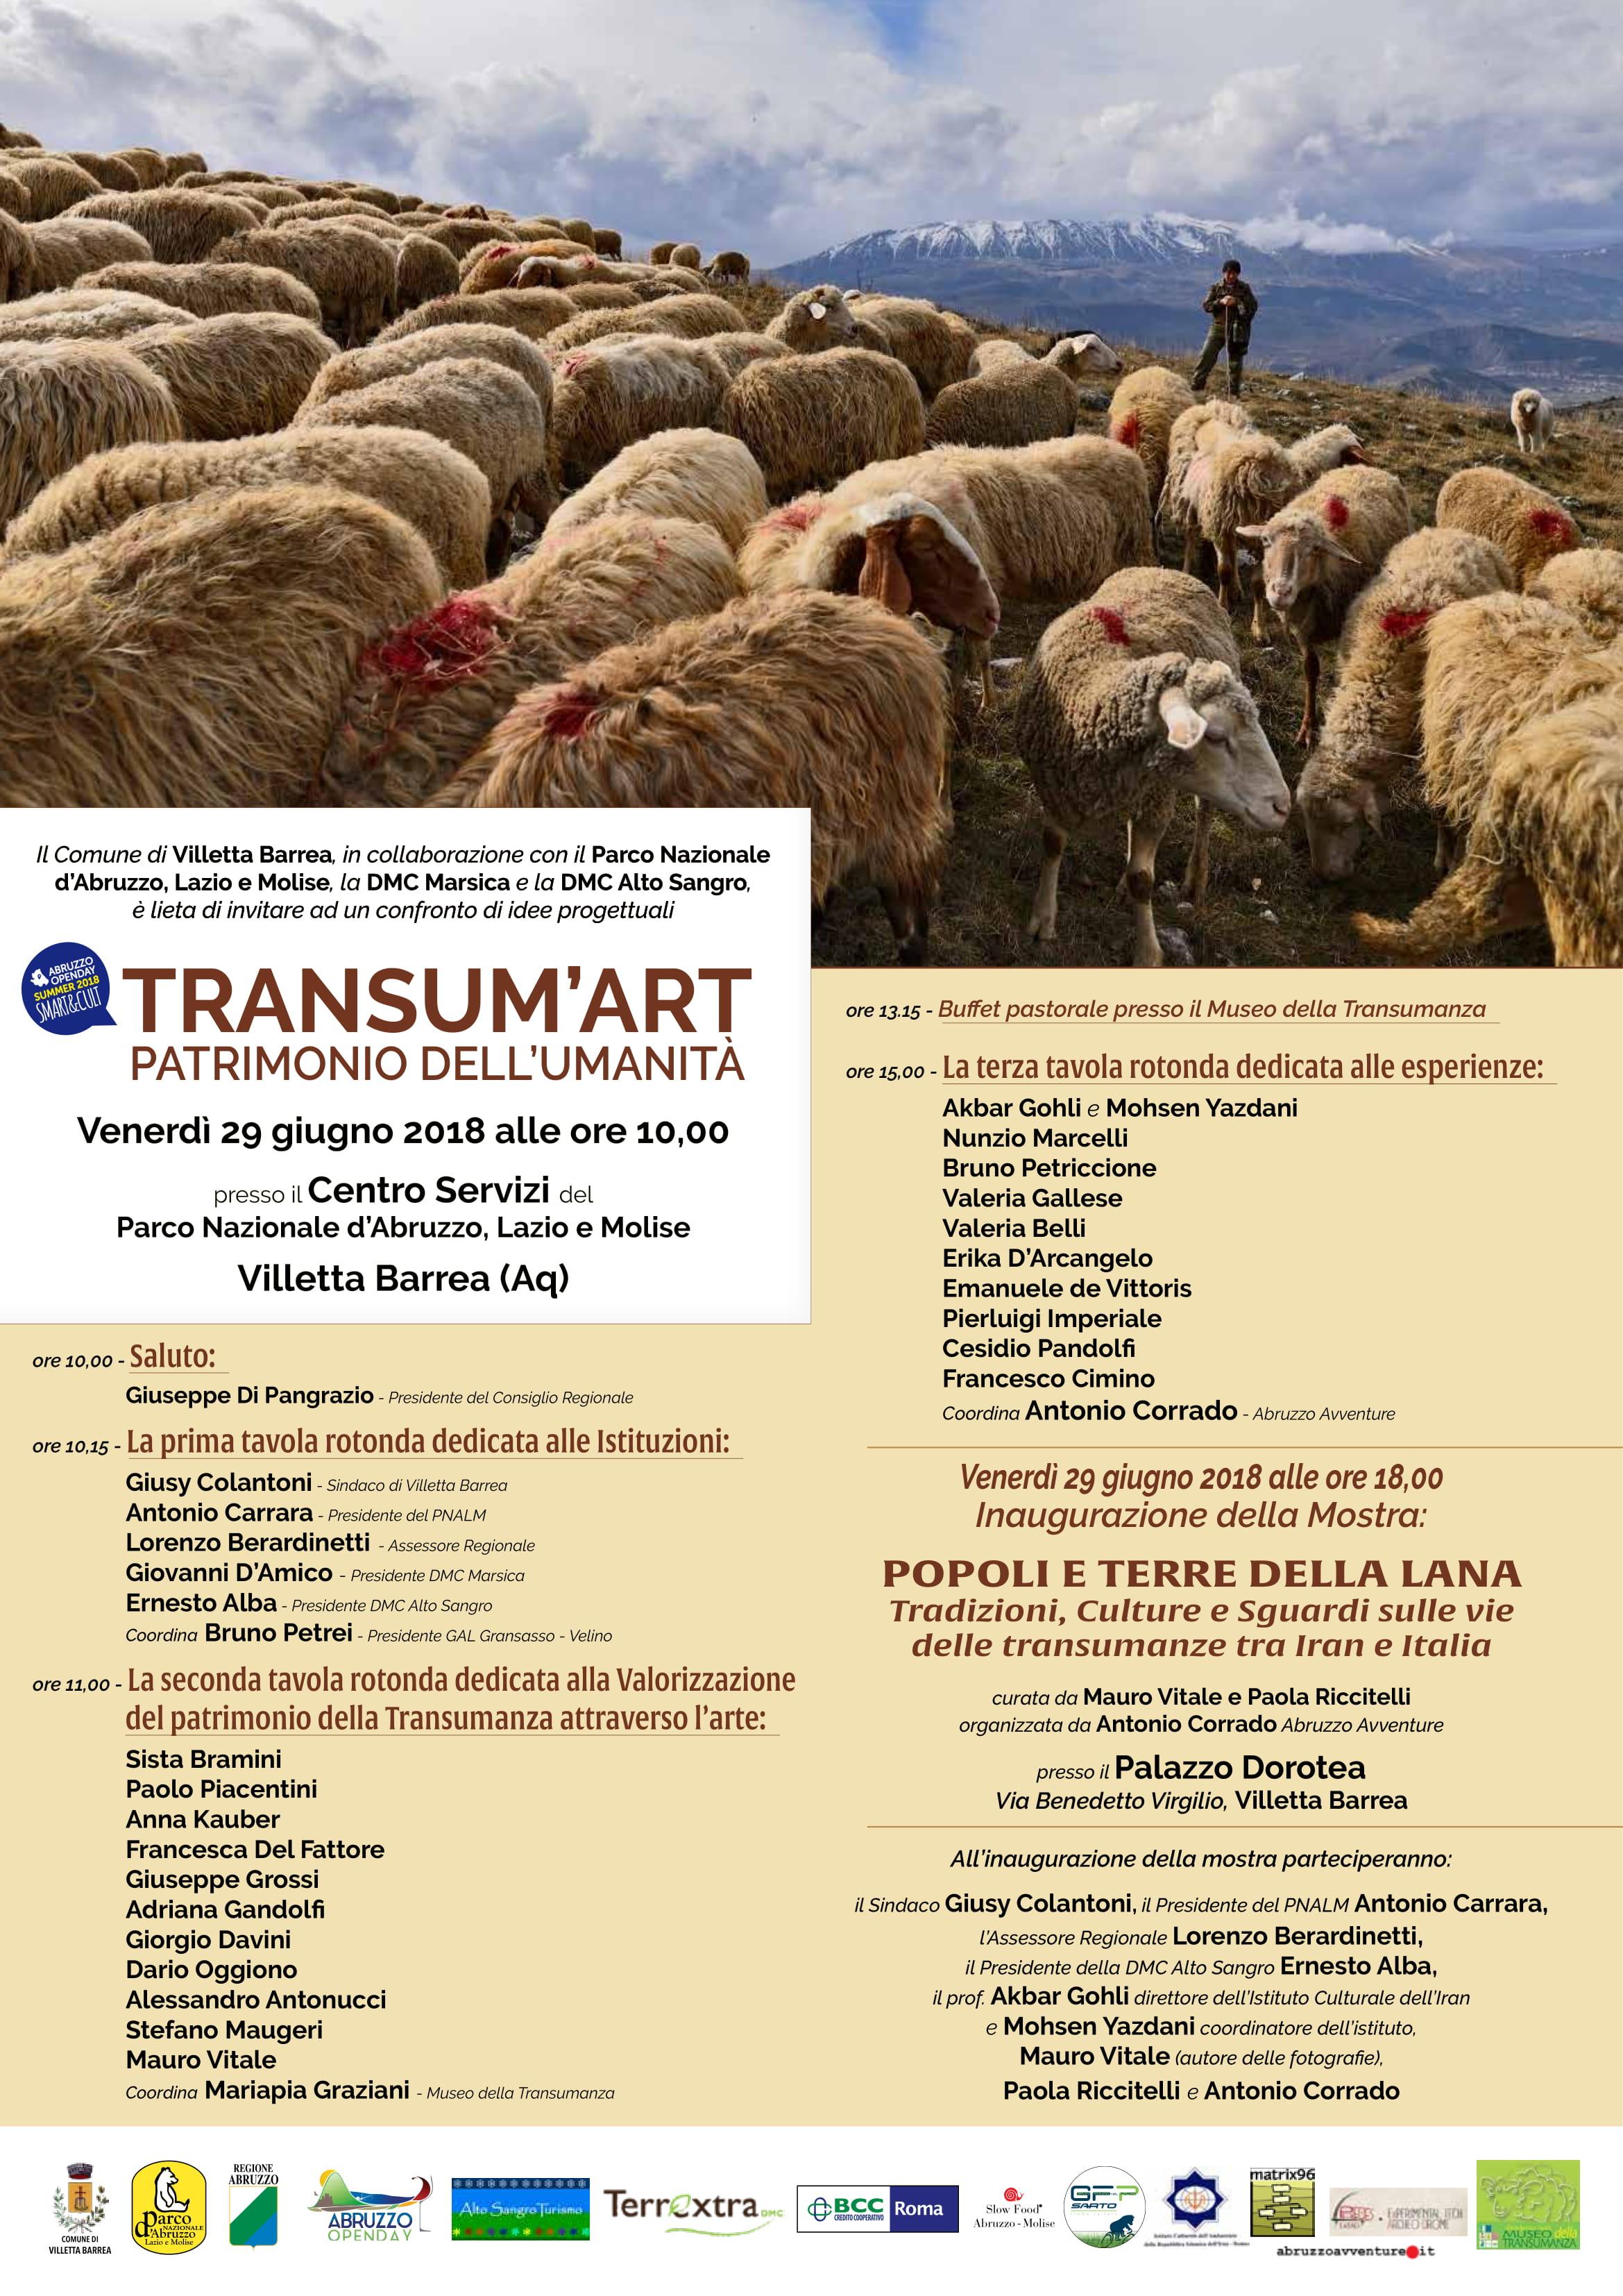 Transumarte-1